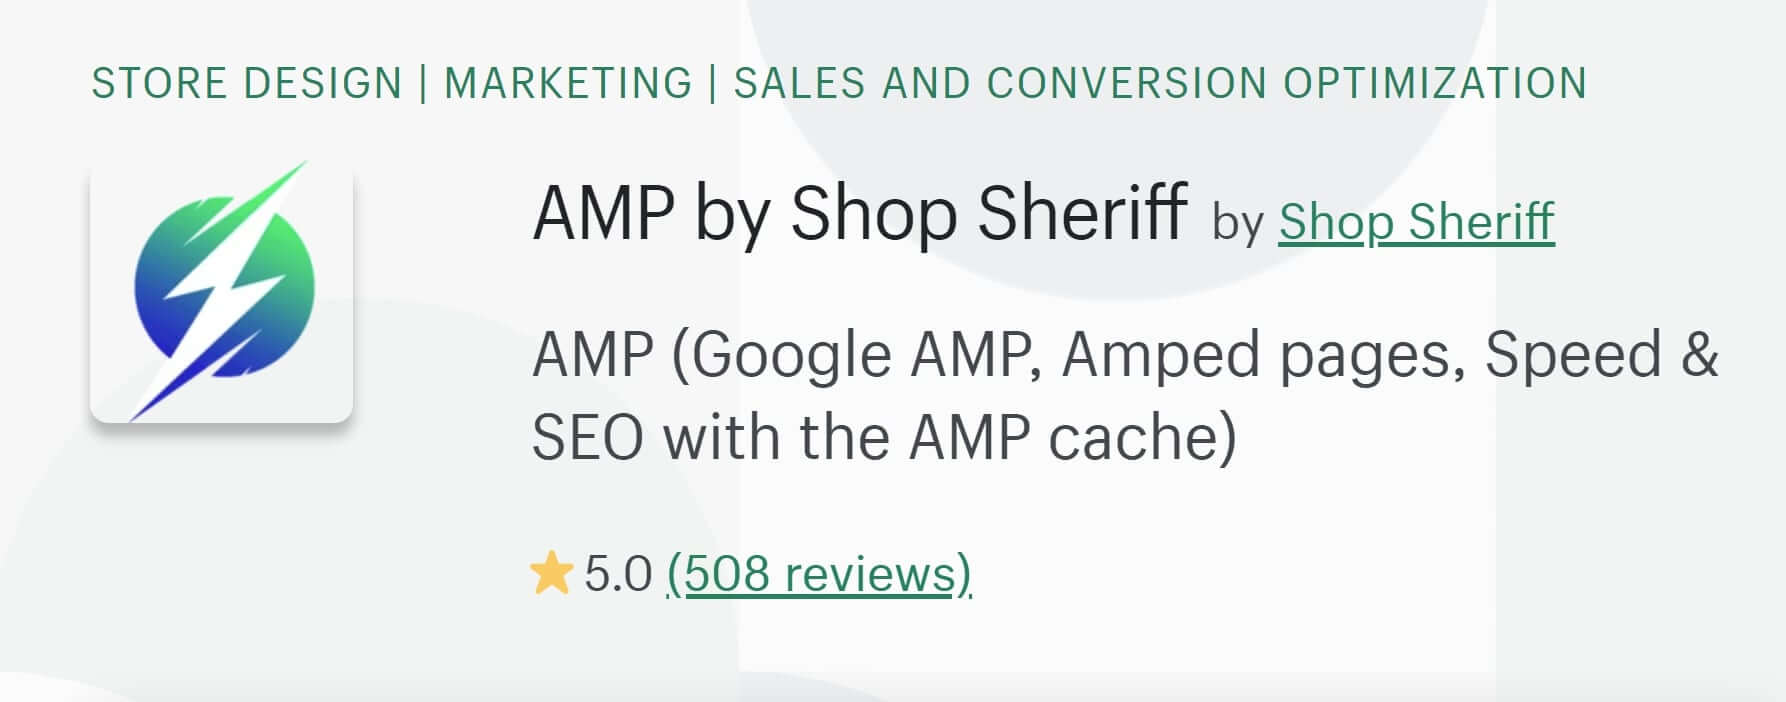 Shop Sheriff Shopify AMP App